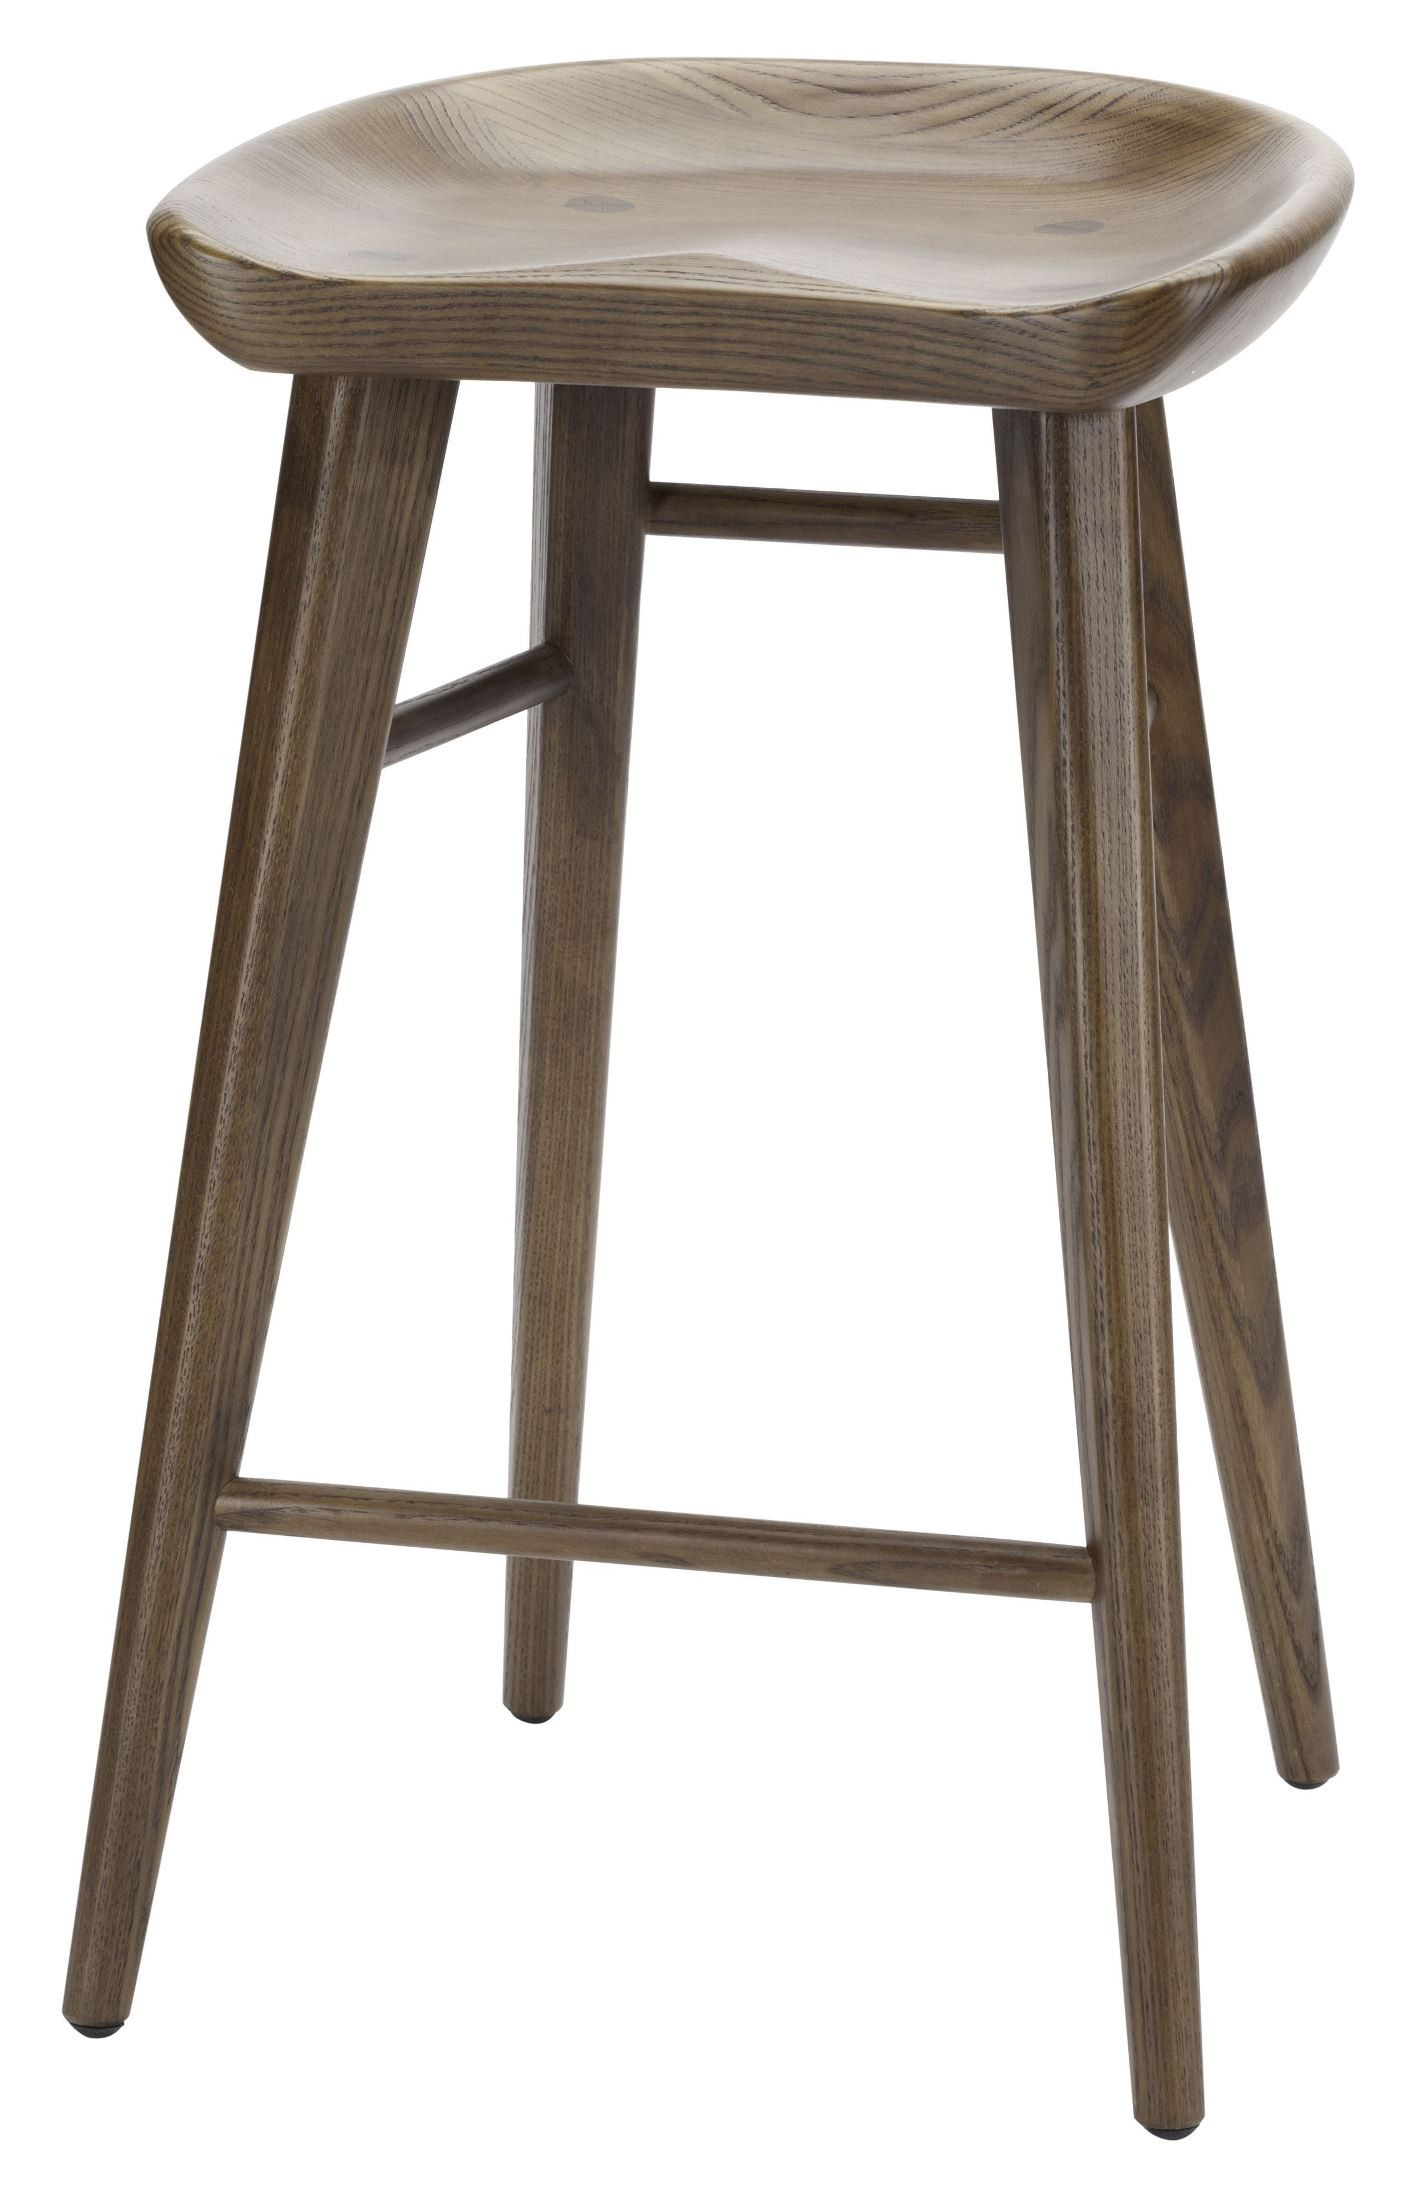 Kami Brown Wood Bar Stool From Nuevo Coleman Furniture